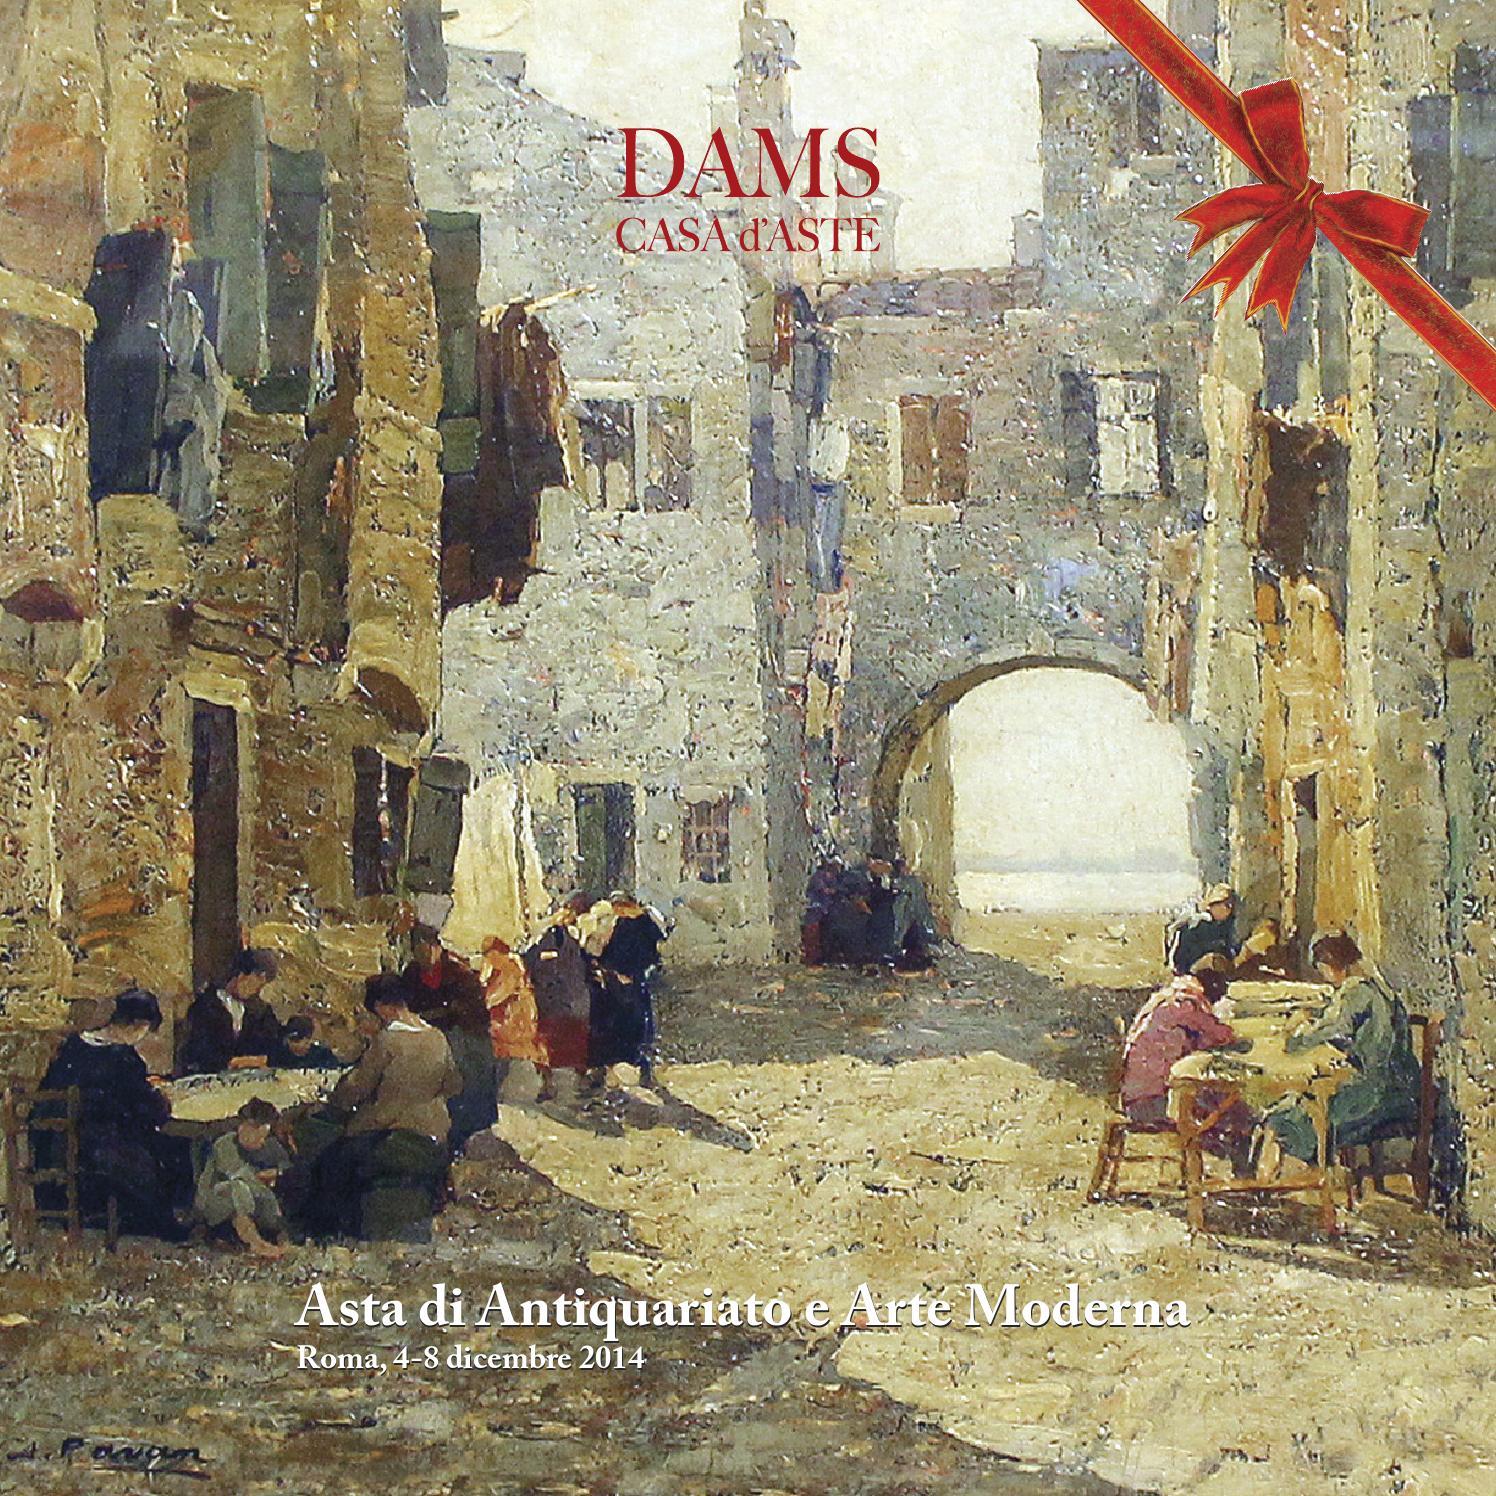 Catalogo asta 16-20 marzo 2016 by Dams Casa Aste - issuu